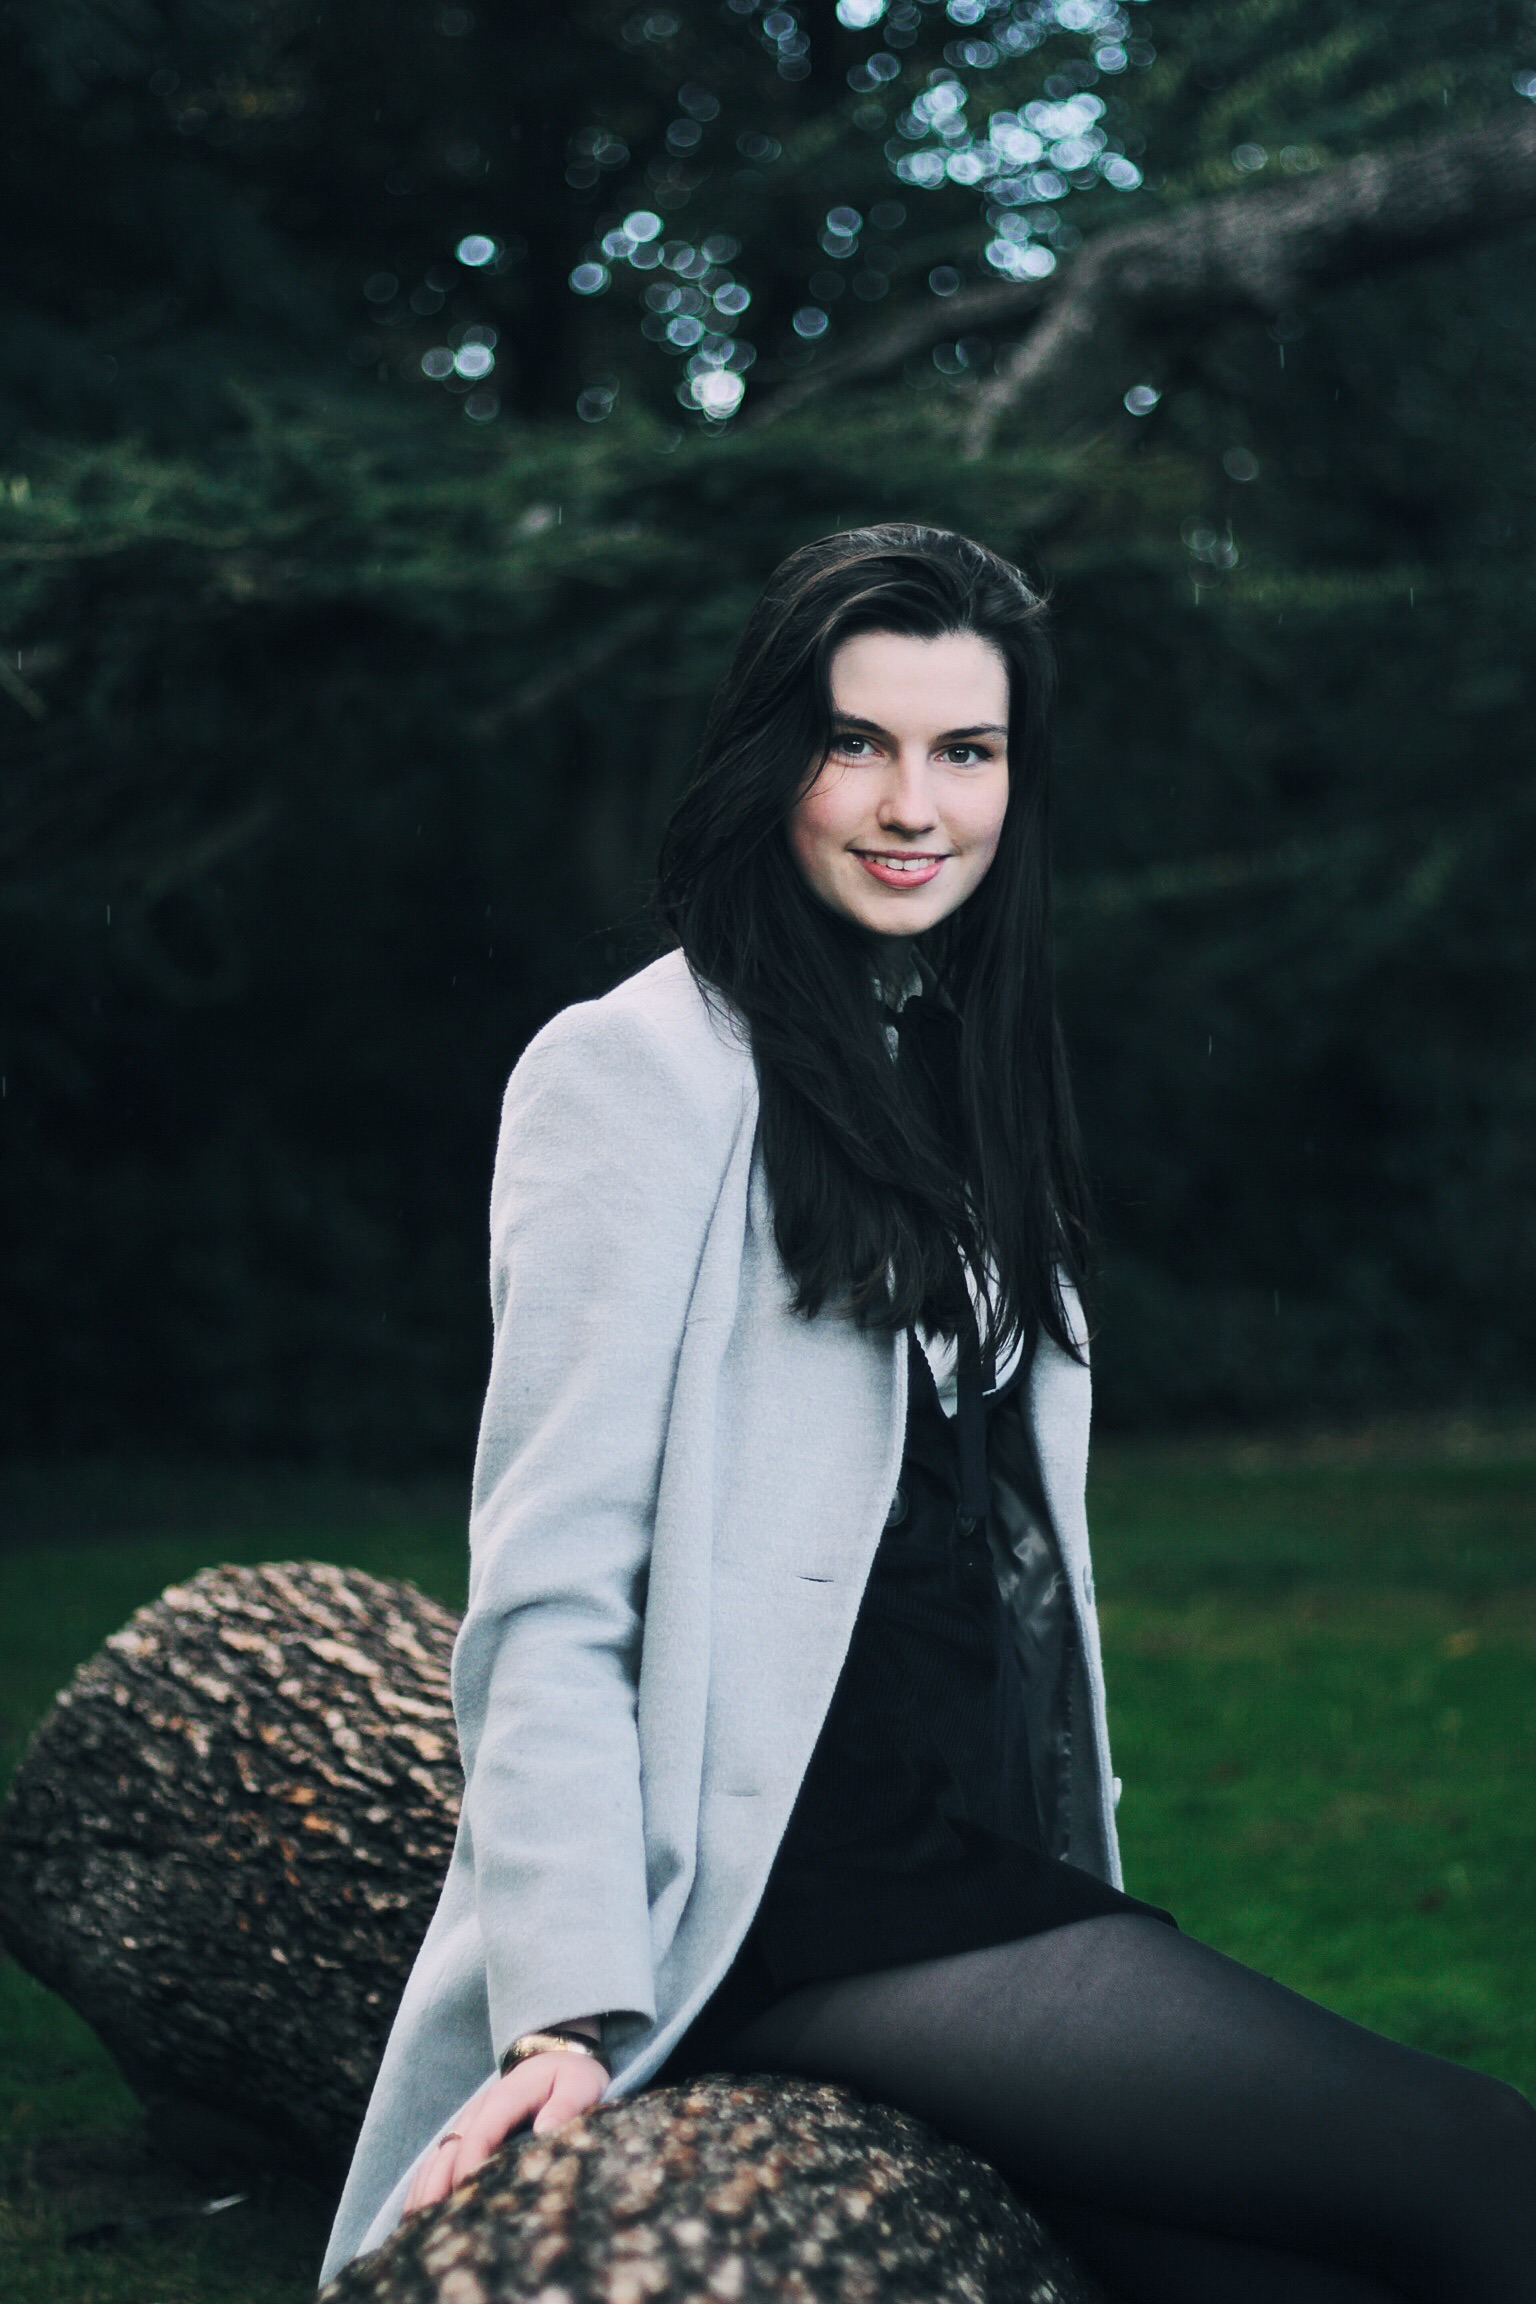 Ciara Drew - Boston Manor Park, Brentford, United Kingdom